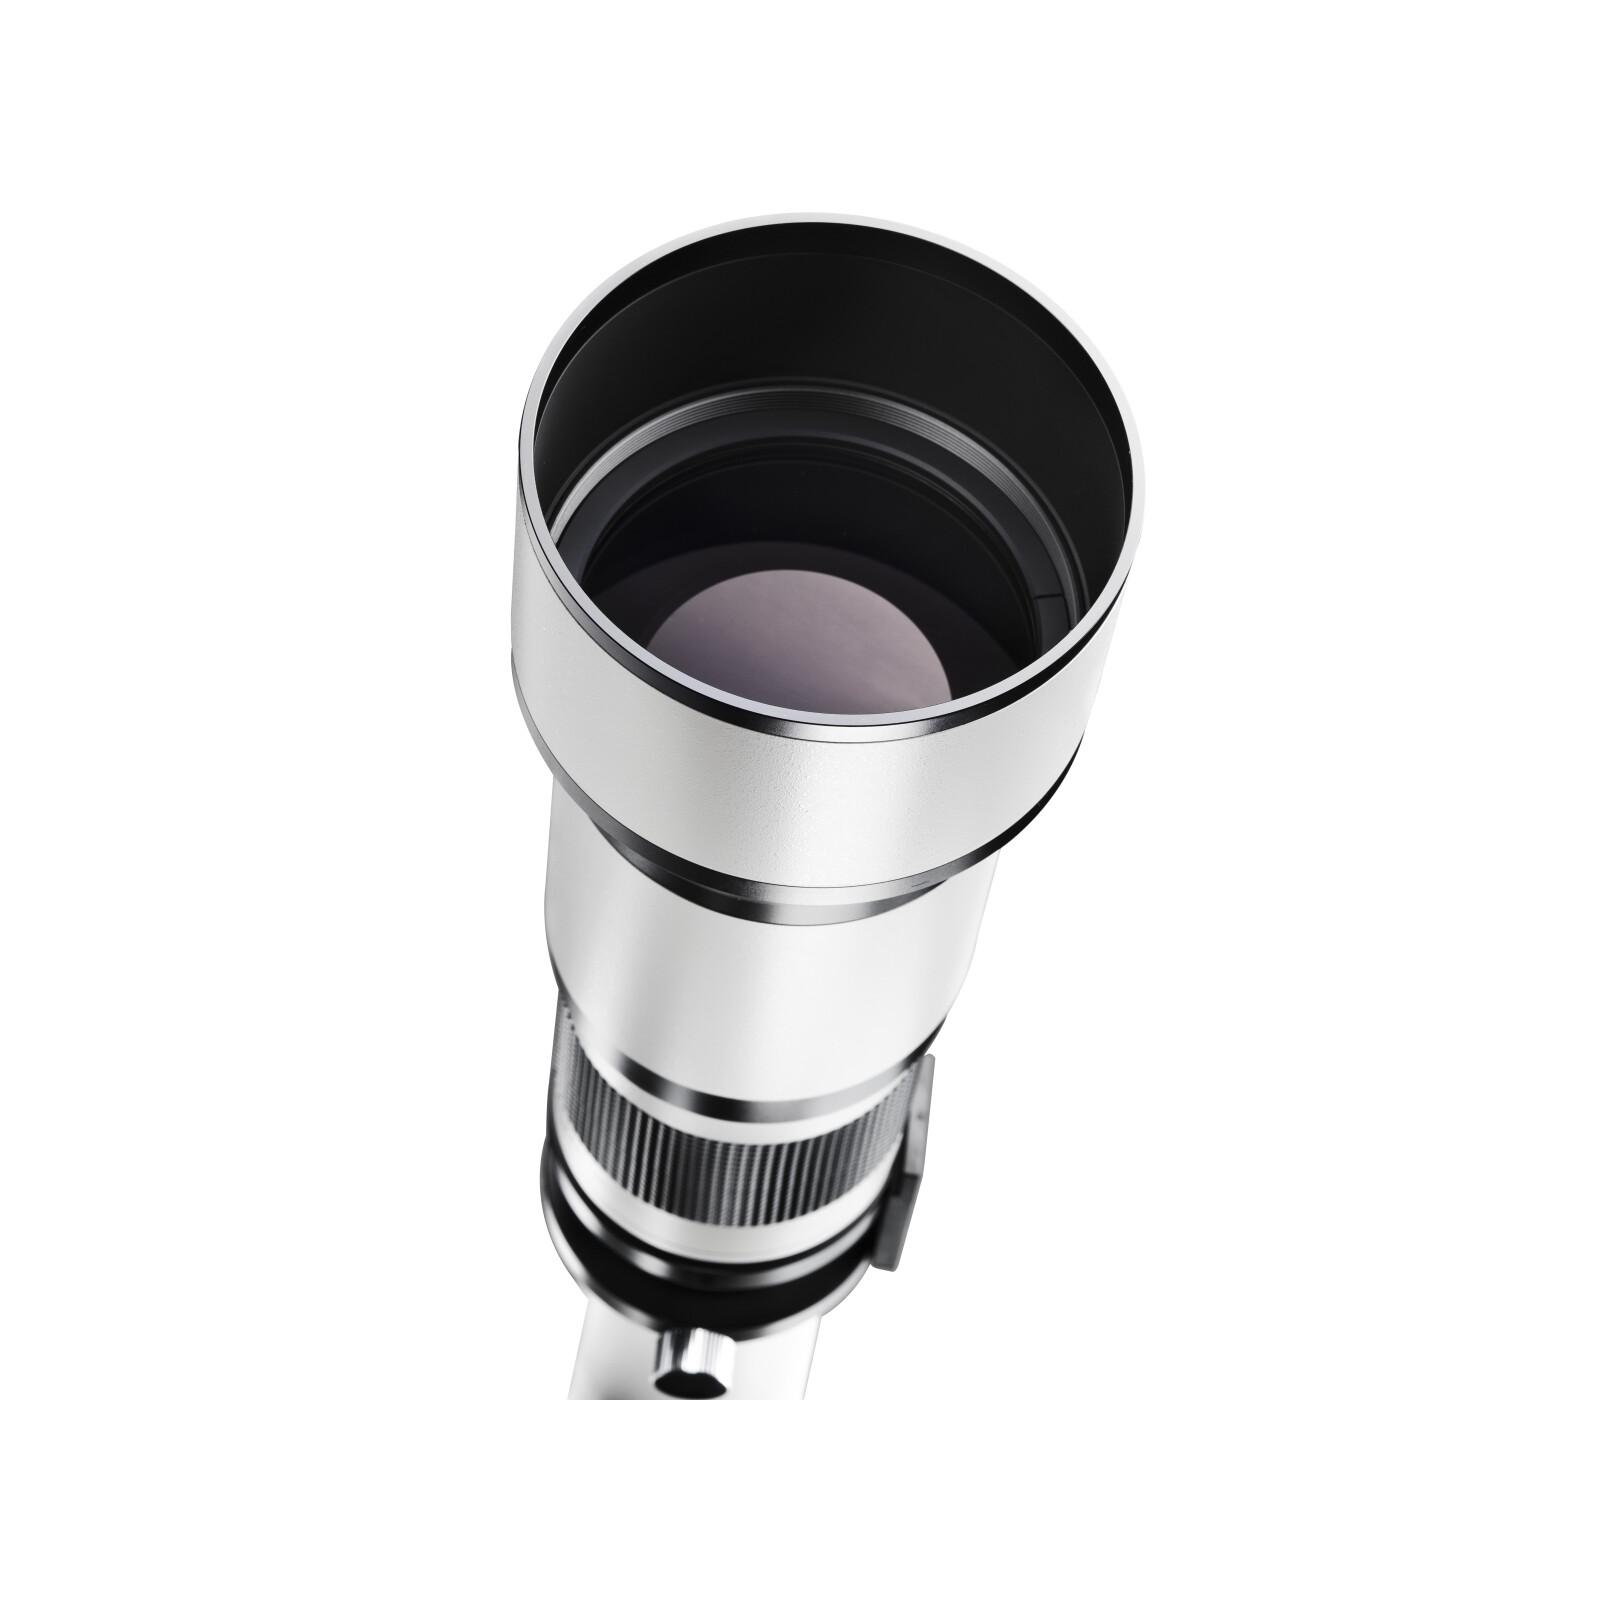 Walimex pro 650-1300/8-16 Nikon Z